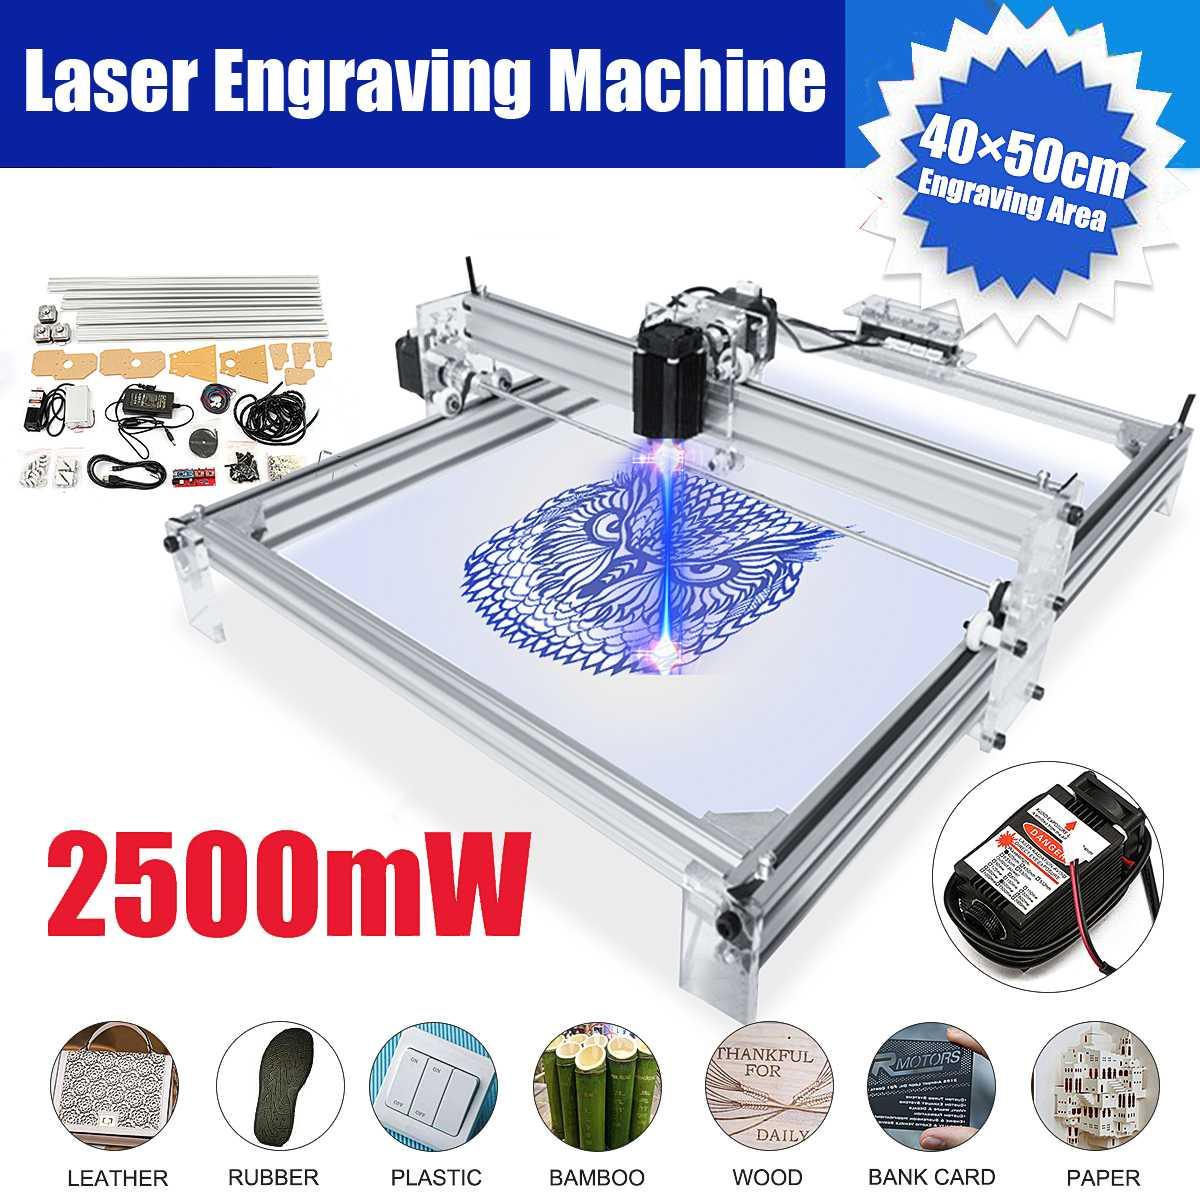 40*50cm Mini 2500MW Laser Engraving Machine 12V DIY Desktop Mini Wood RouterCutting/Engraving Machine With Laser Goggles